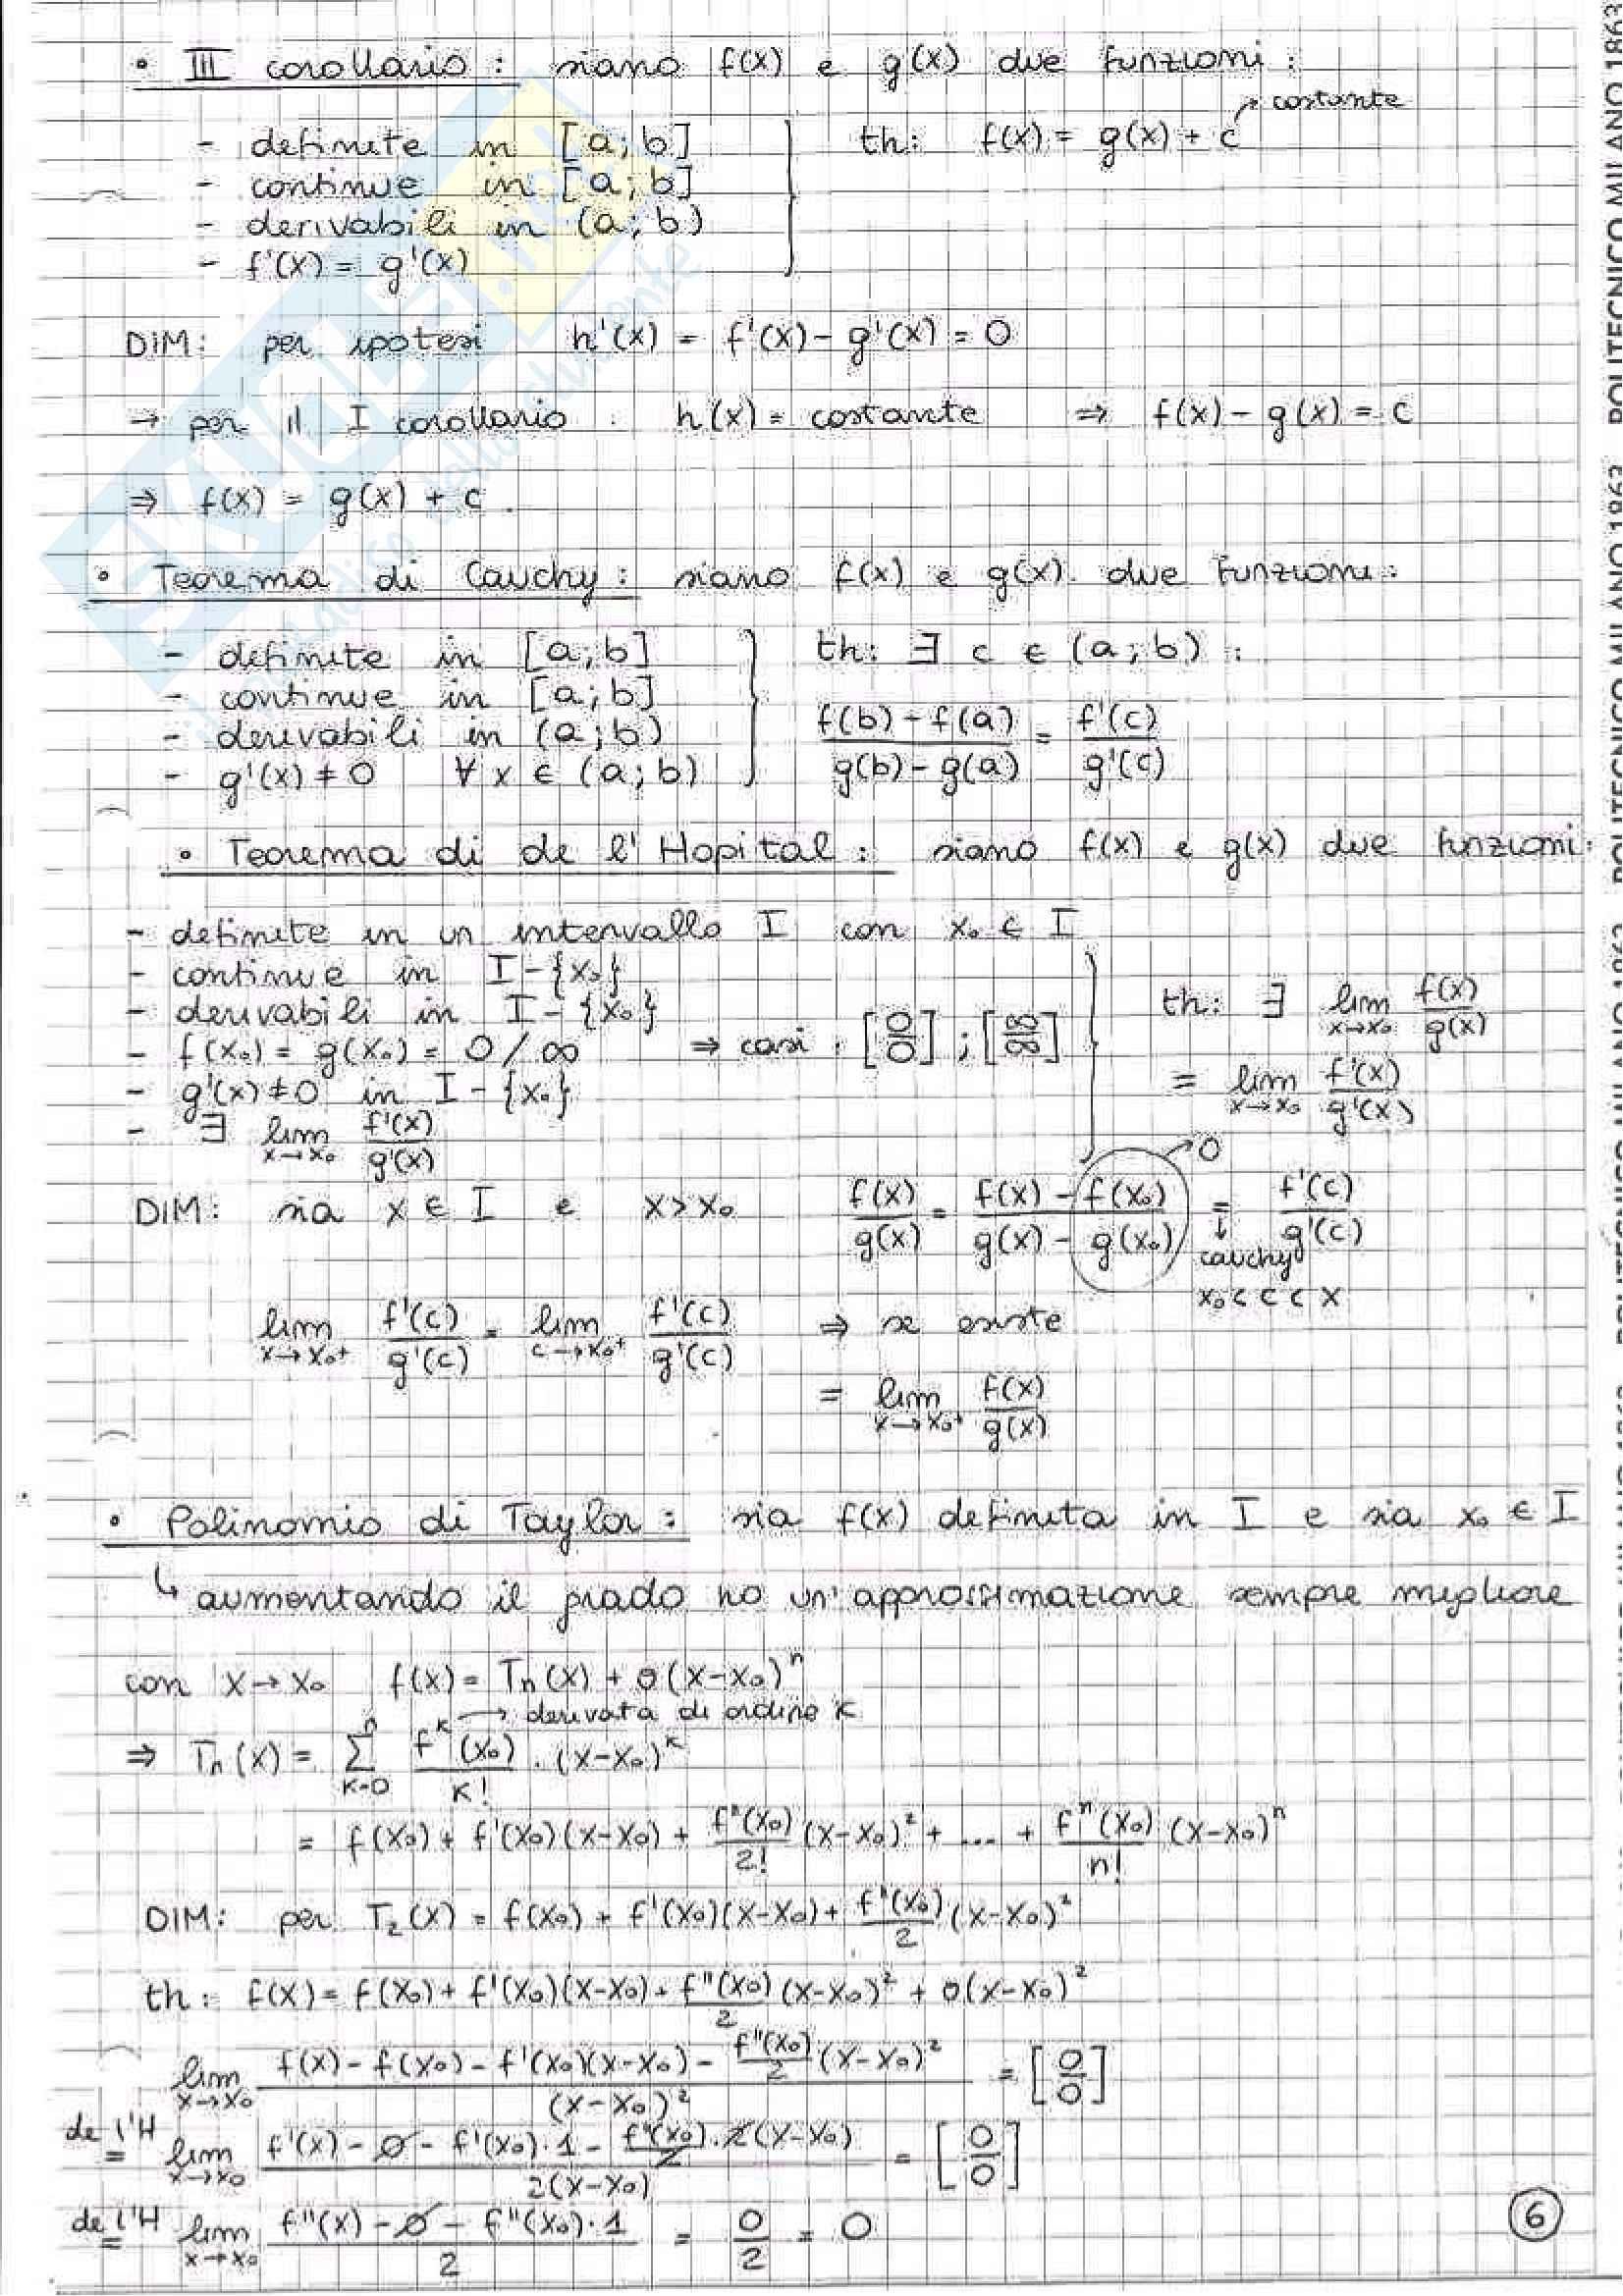 Appunti per passare l'esame di Analisi Matematica 1 Pag. 11